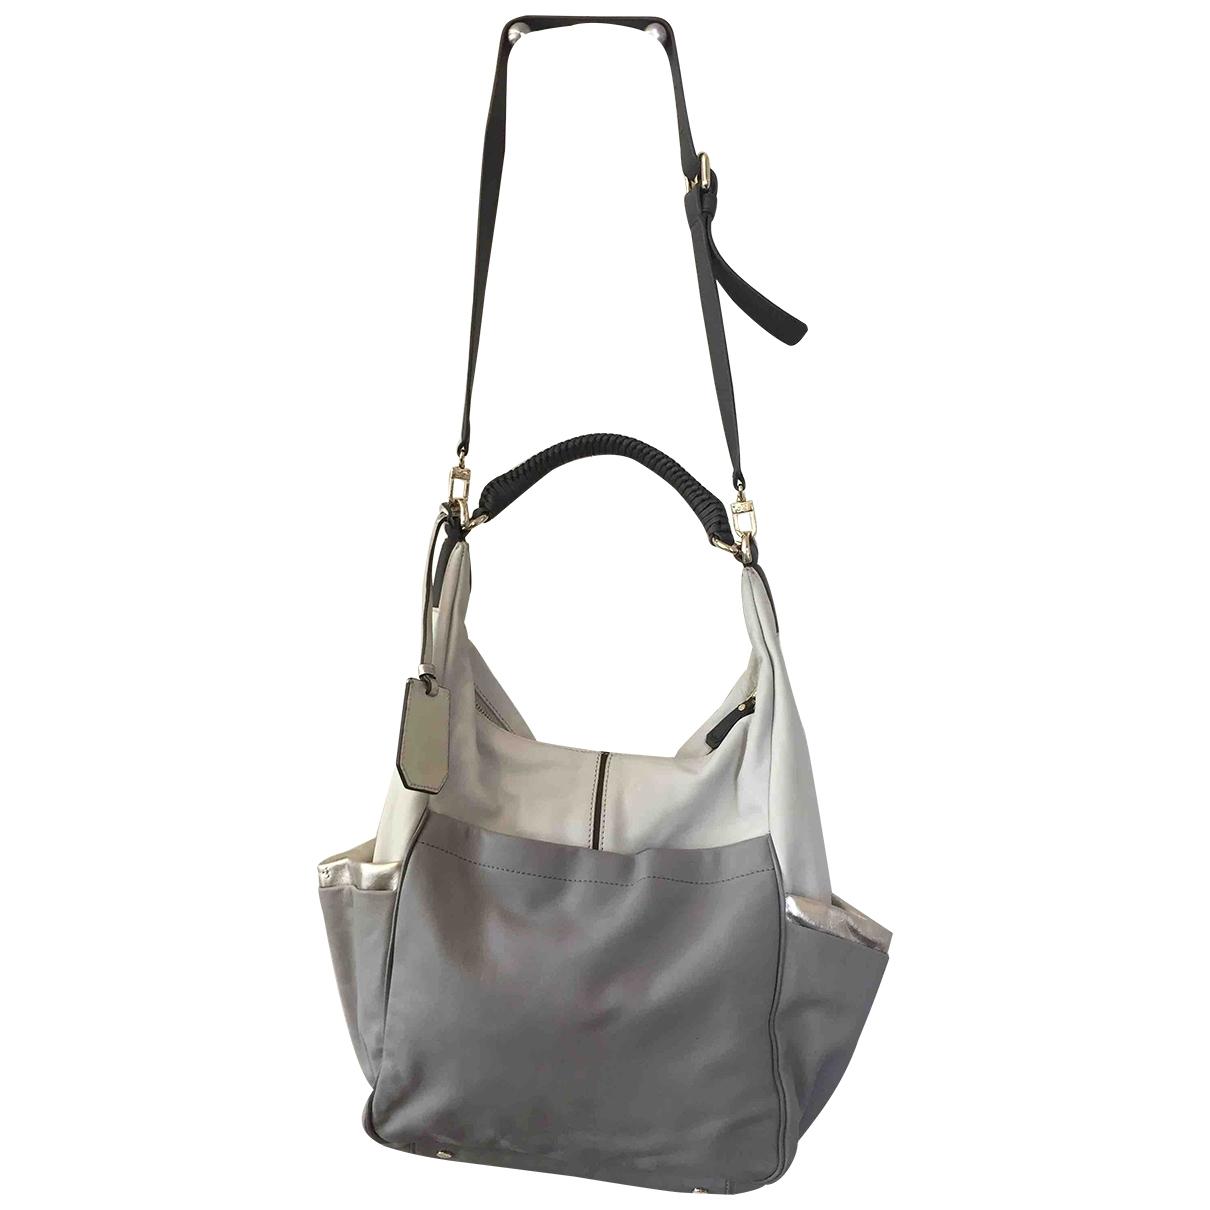 Diane Von Furstenberg \N Multicolour Leather handbag for Women \N